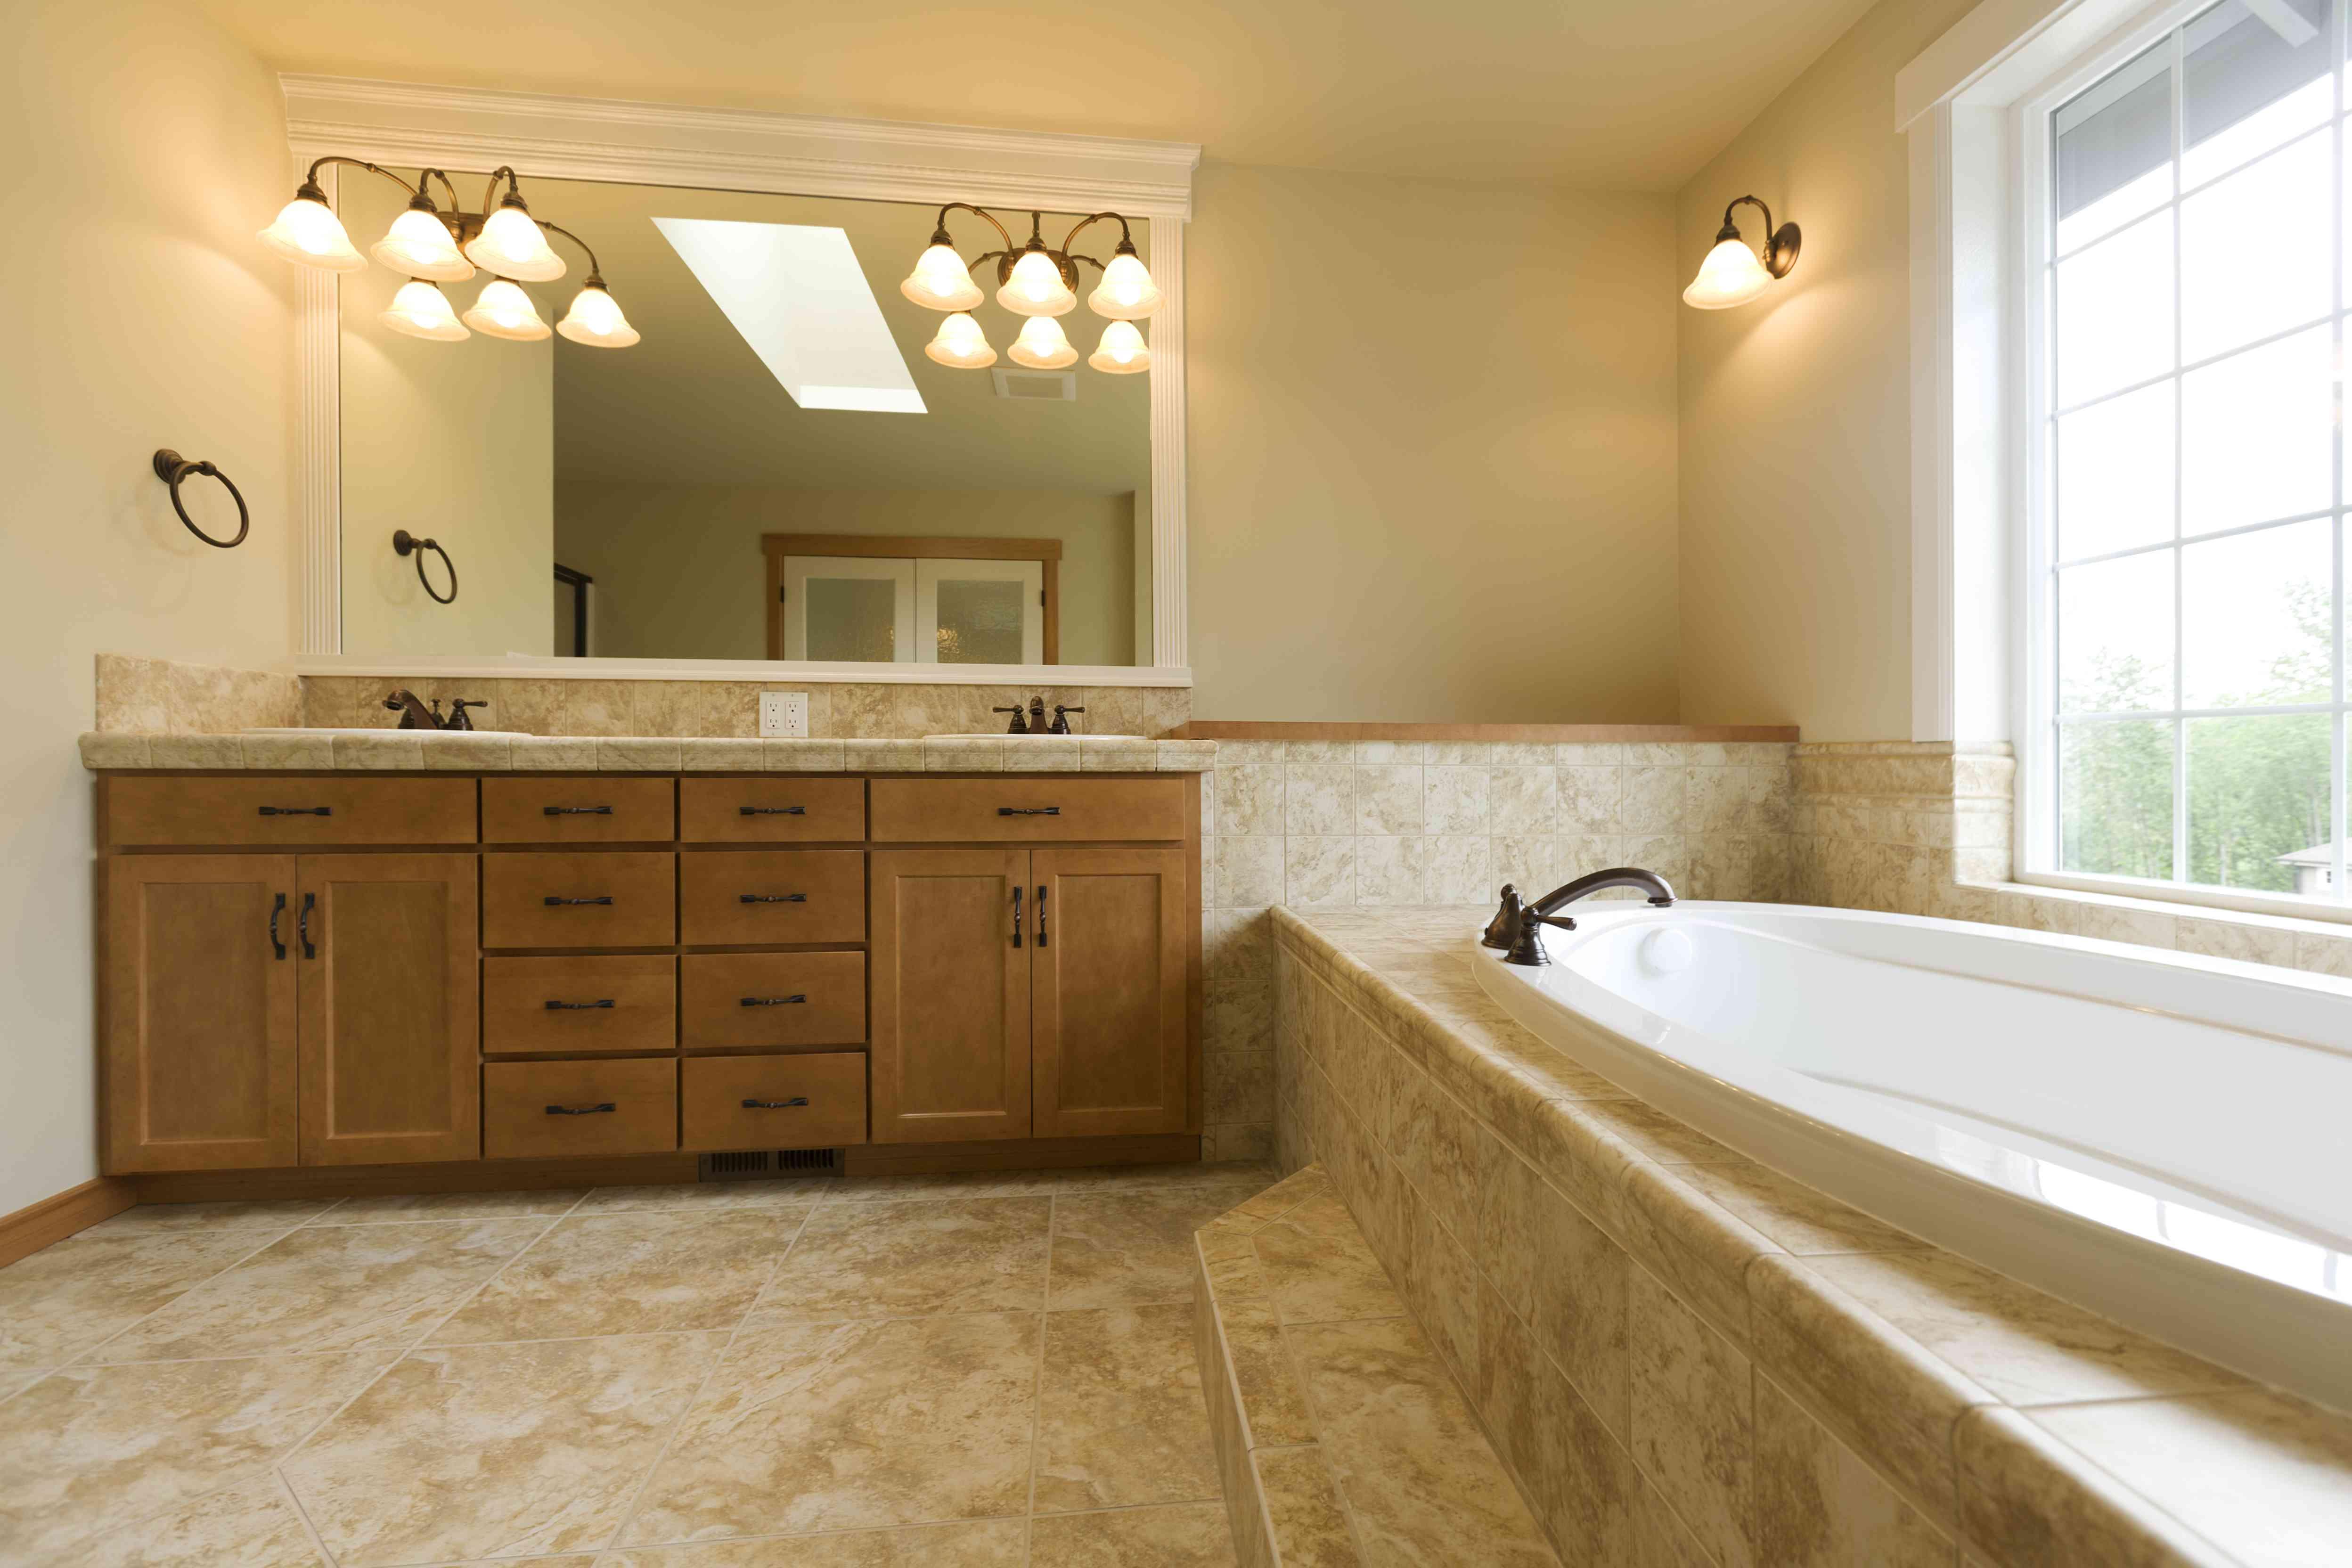 Luxury bathroom with travertine floors